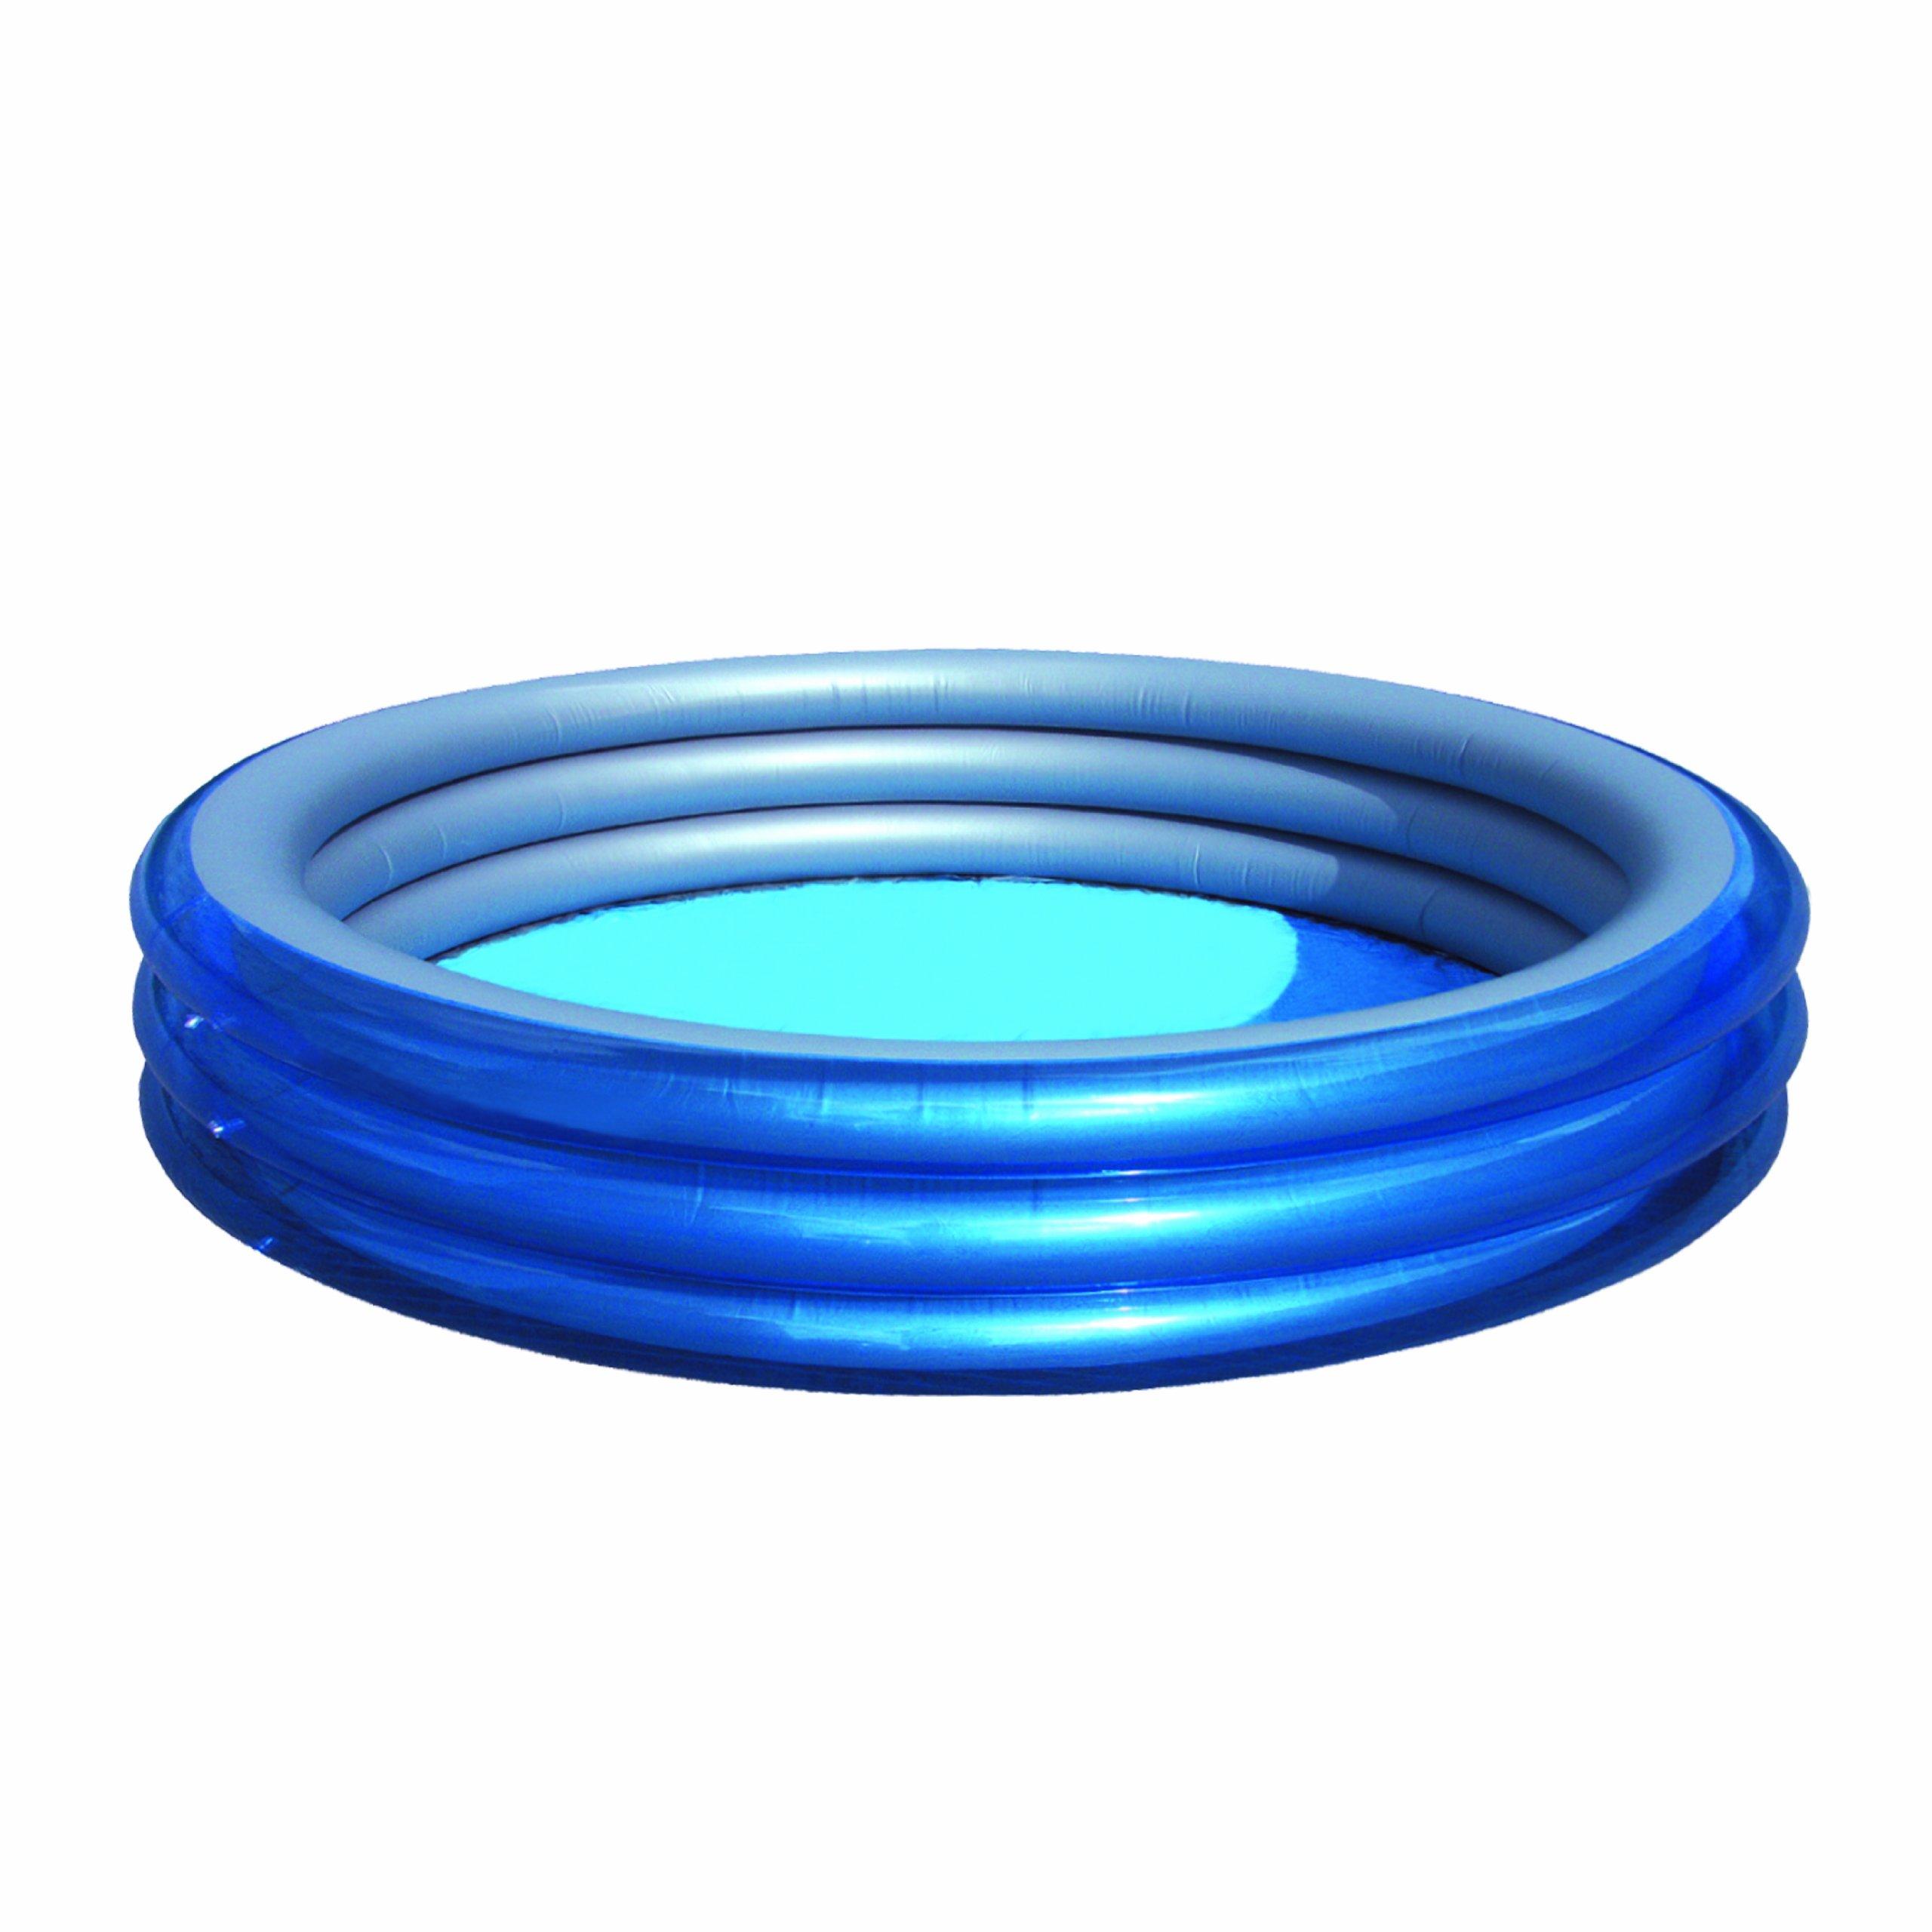 H2OGO! Big Metallic 3-Ring Inflatable Play Pool by Bestway (Image #2)